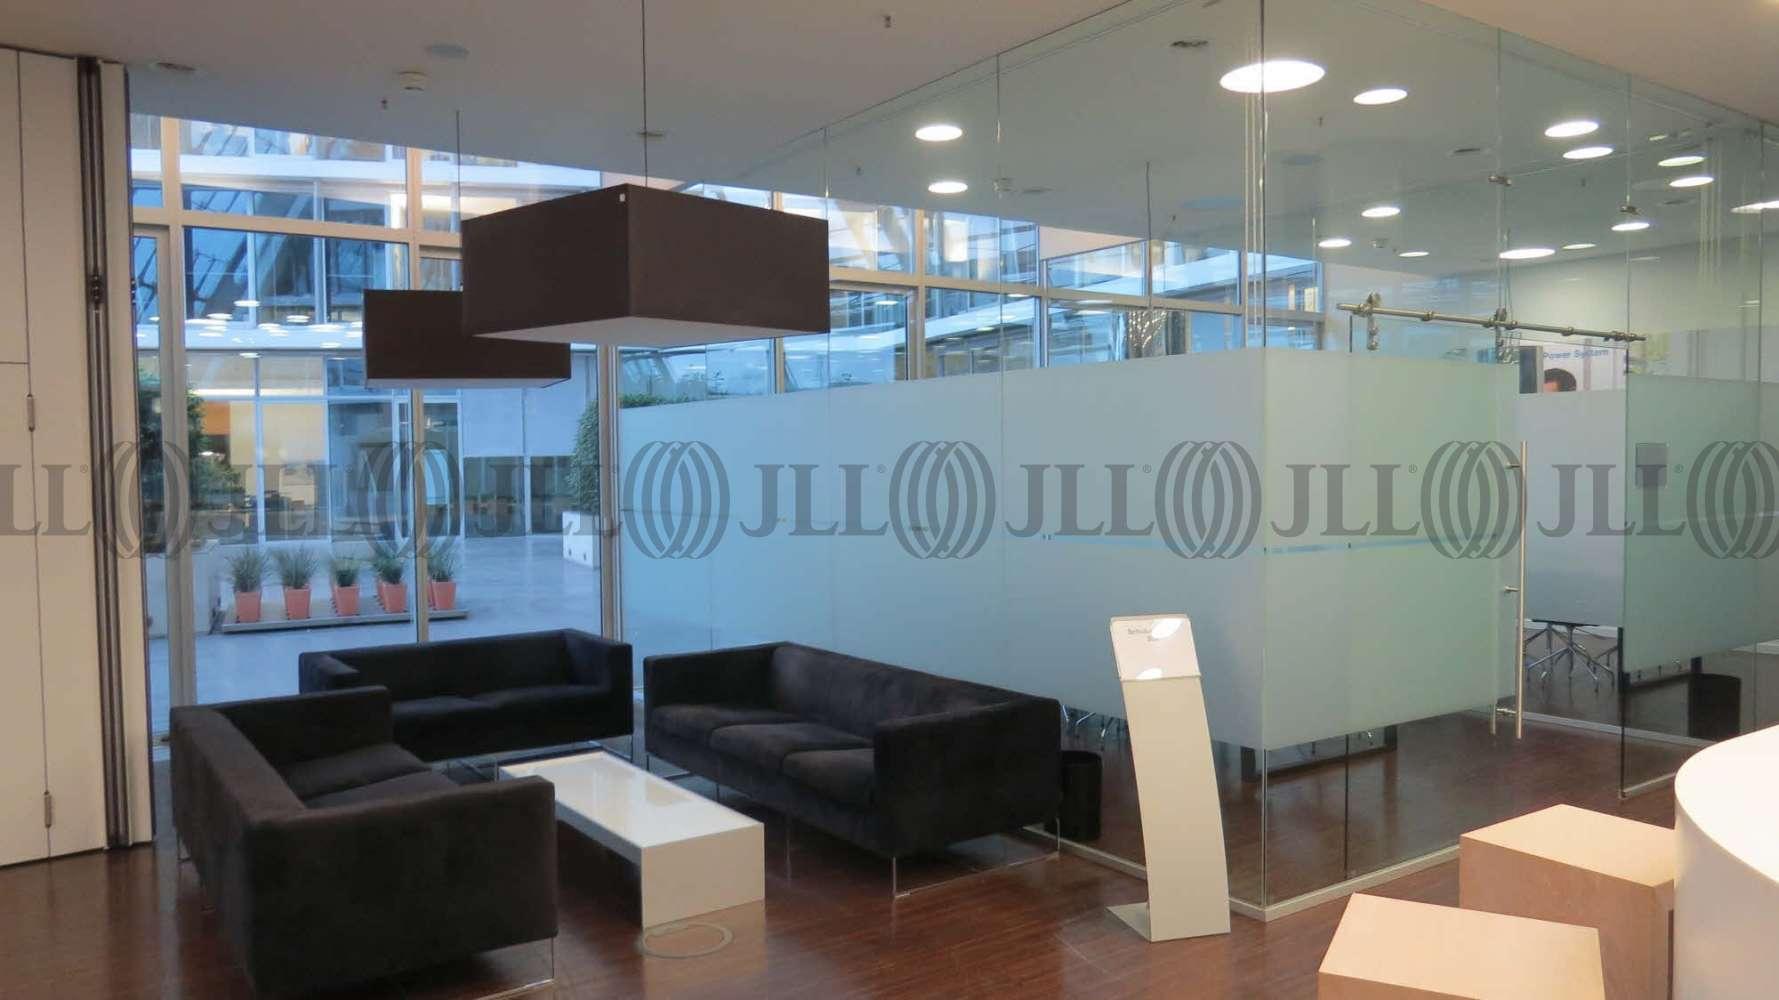 Büros Hamburg, 20537 - Büro - Hamburg, Hammerbrook - H0114 - 9518807